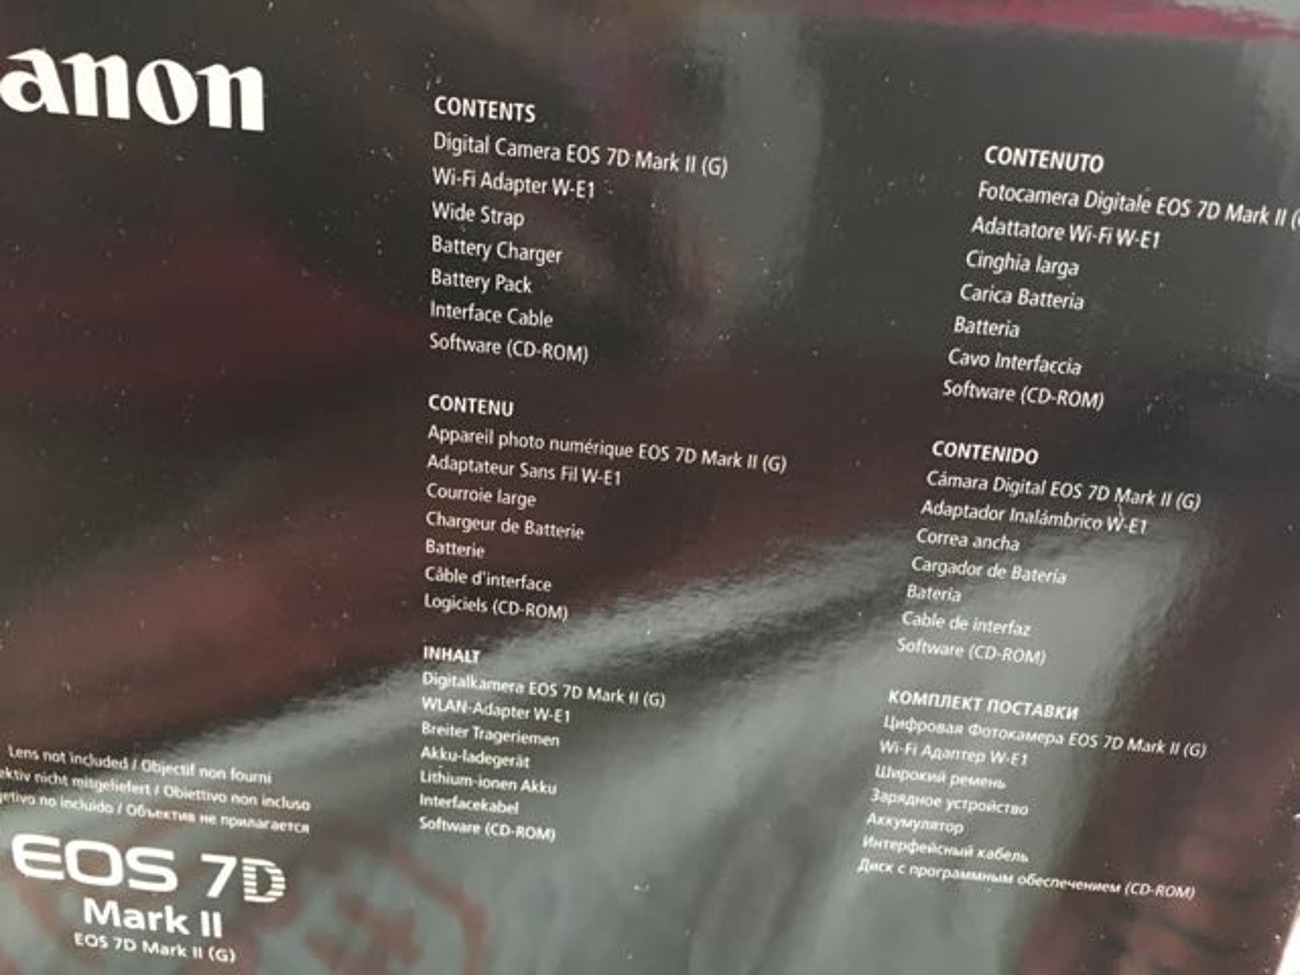 Buy Canon 7D Mark II Body Only | Fat Llama